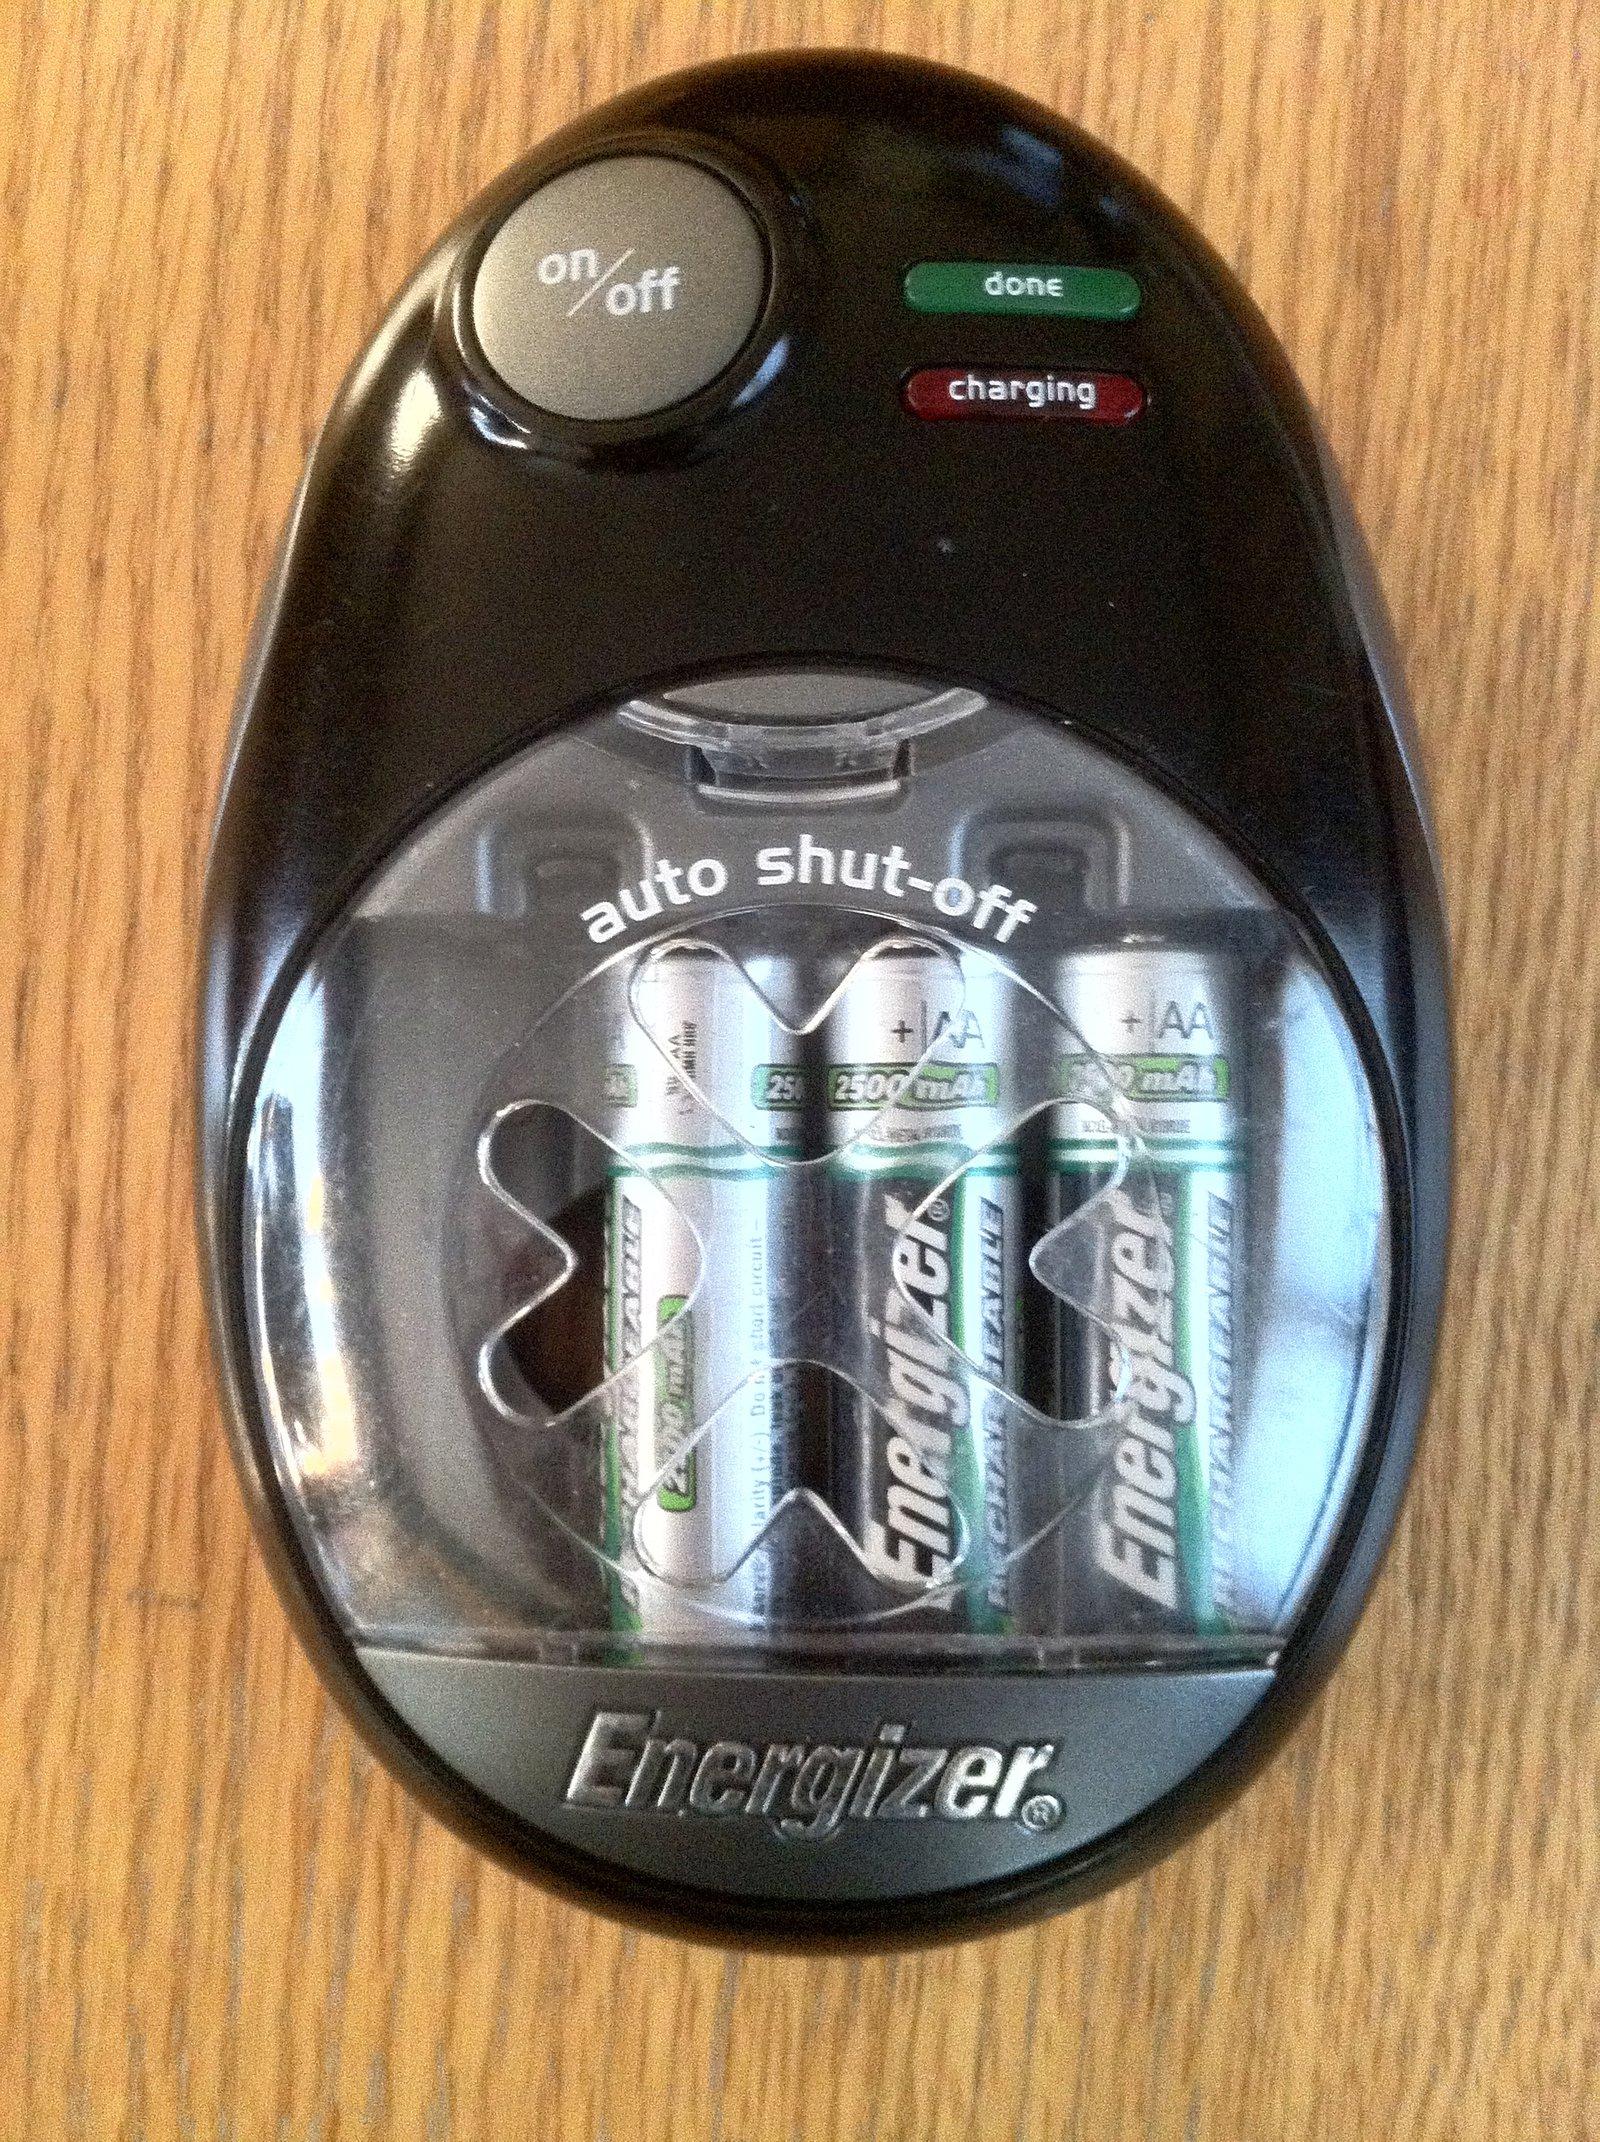 rechargable batteries, 3 of them